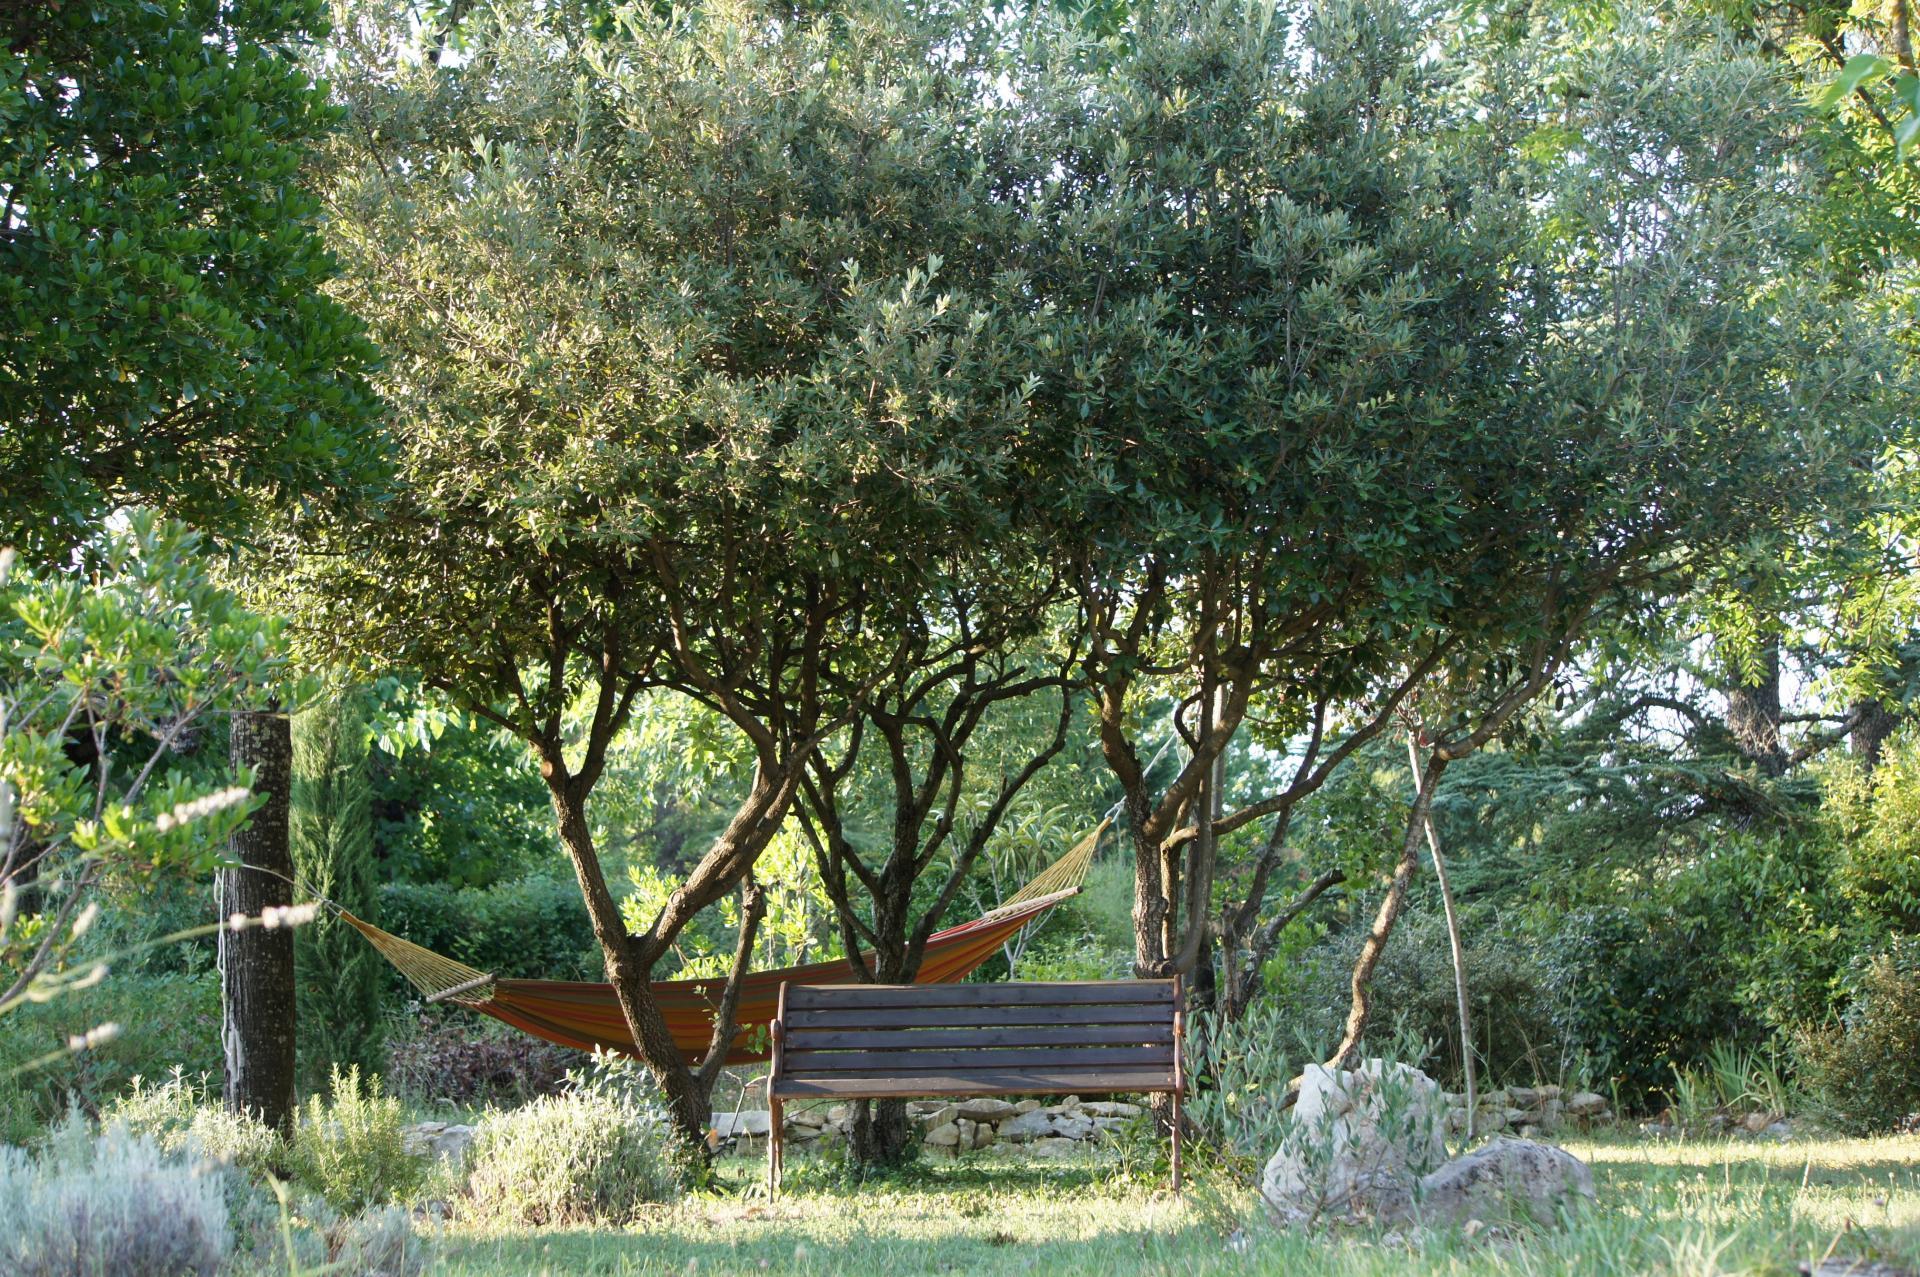 A l'ombre des chênes verts